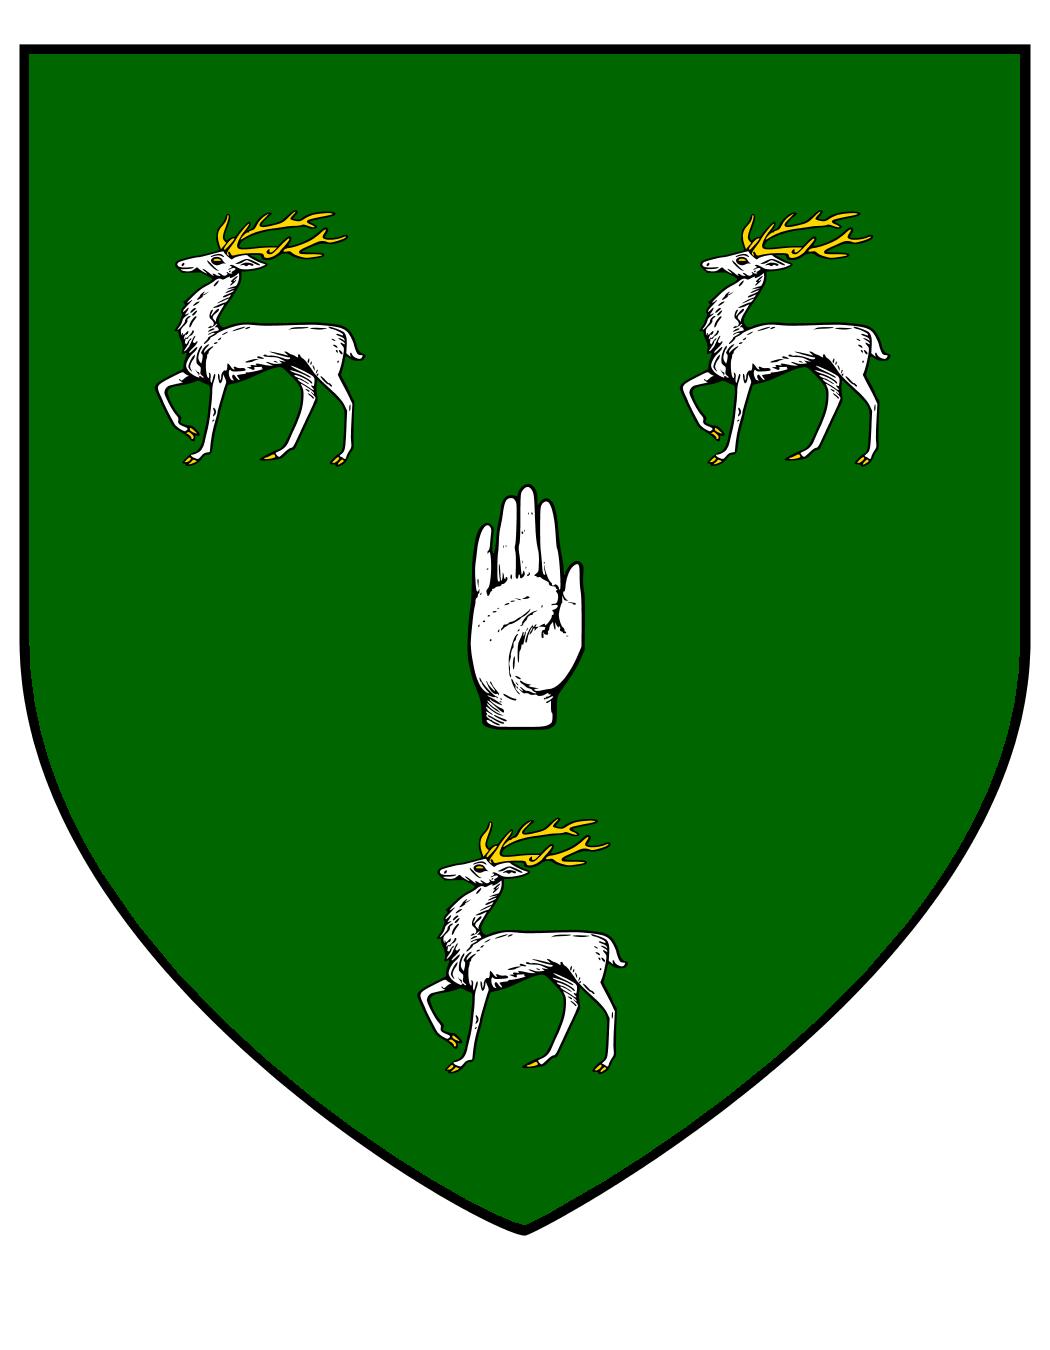 coat_of_arms_Matthias_von_Luckenwalde.png